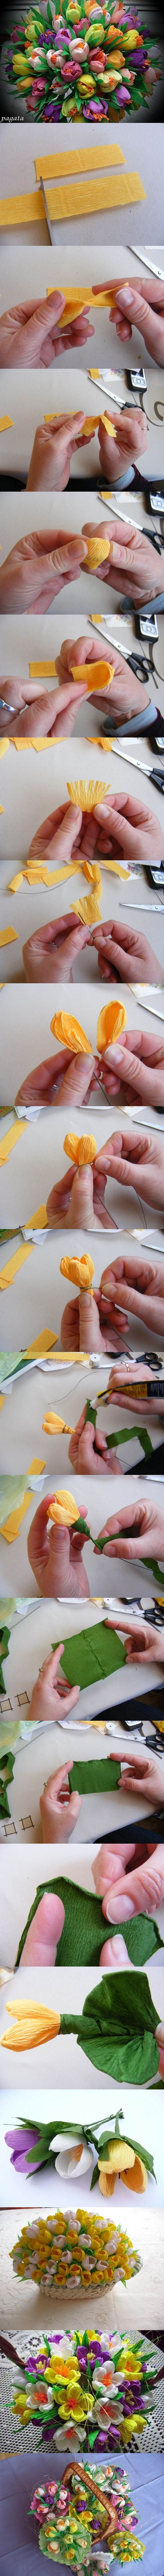 CREPE PAPER CROCUS DIY Bouquet of Crepe Paper Crocuses http://www.icreativeideas.com/diy-beautiful-bouquet-of-crepe-paper-crocuses/